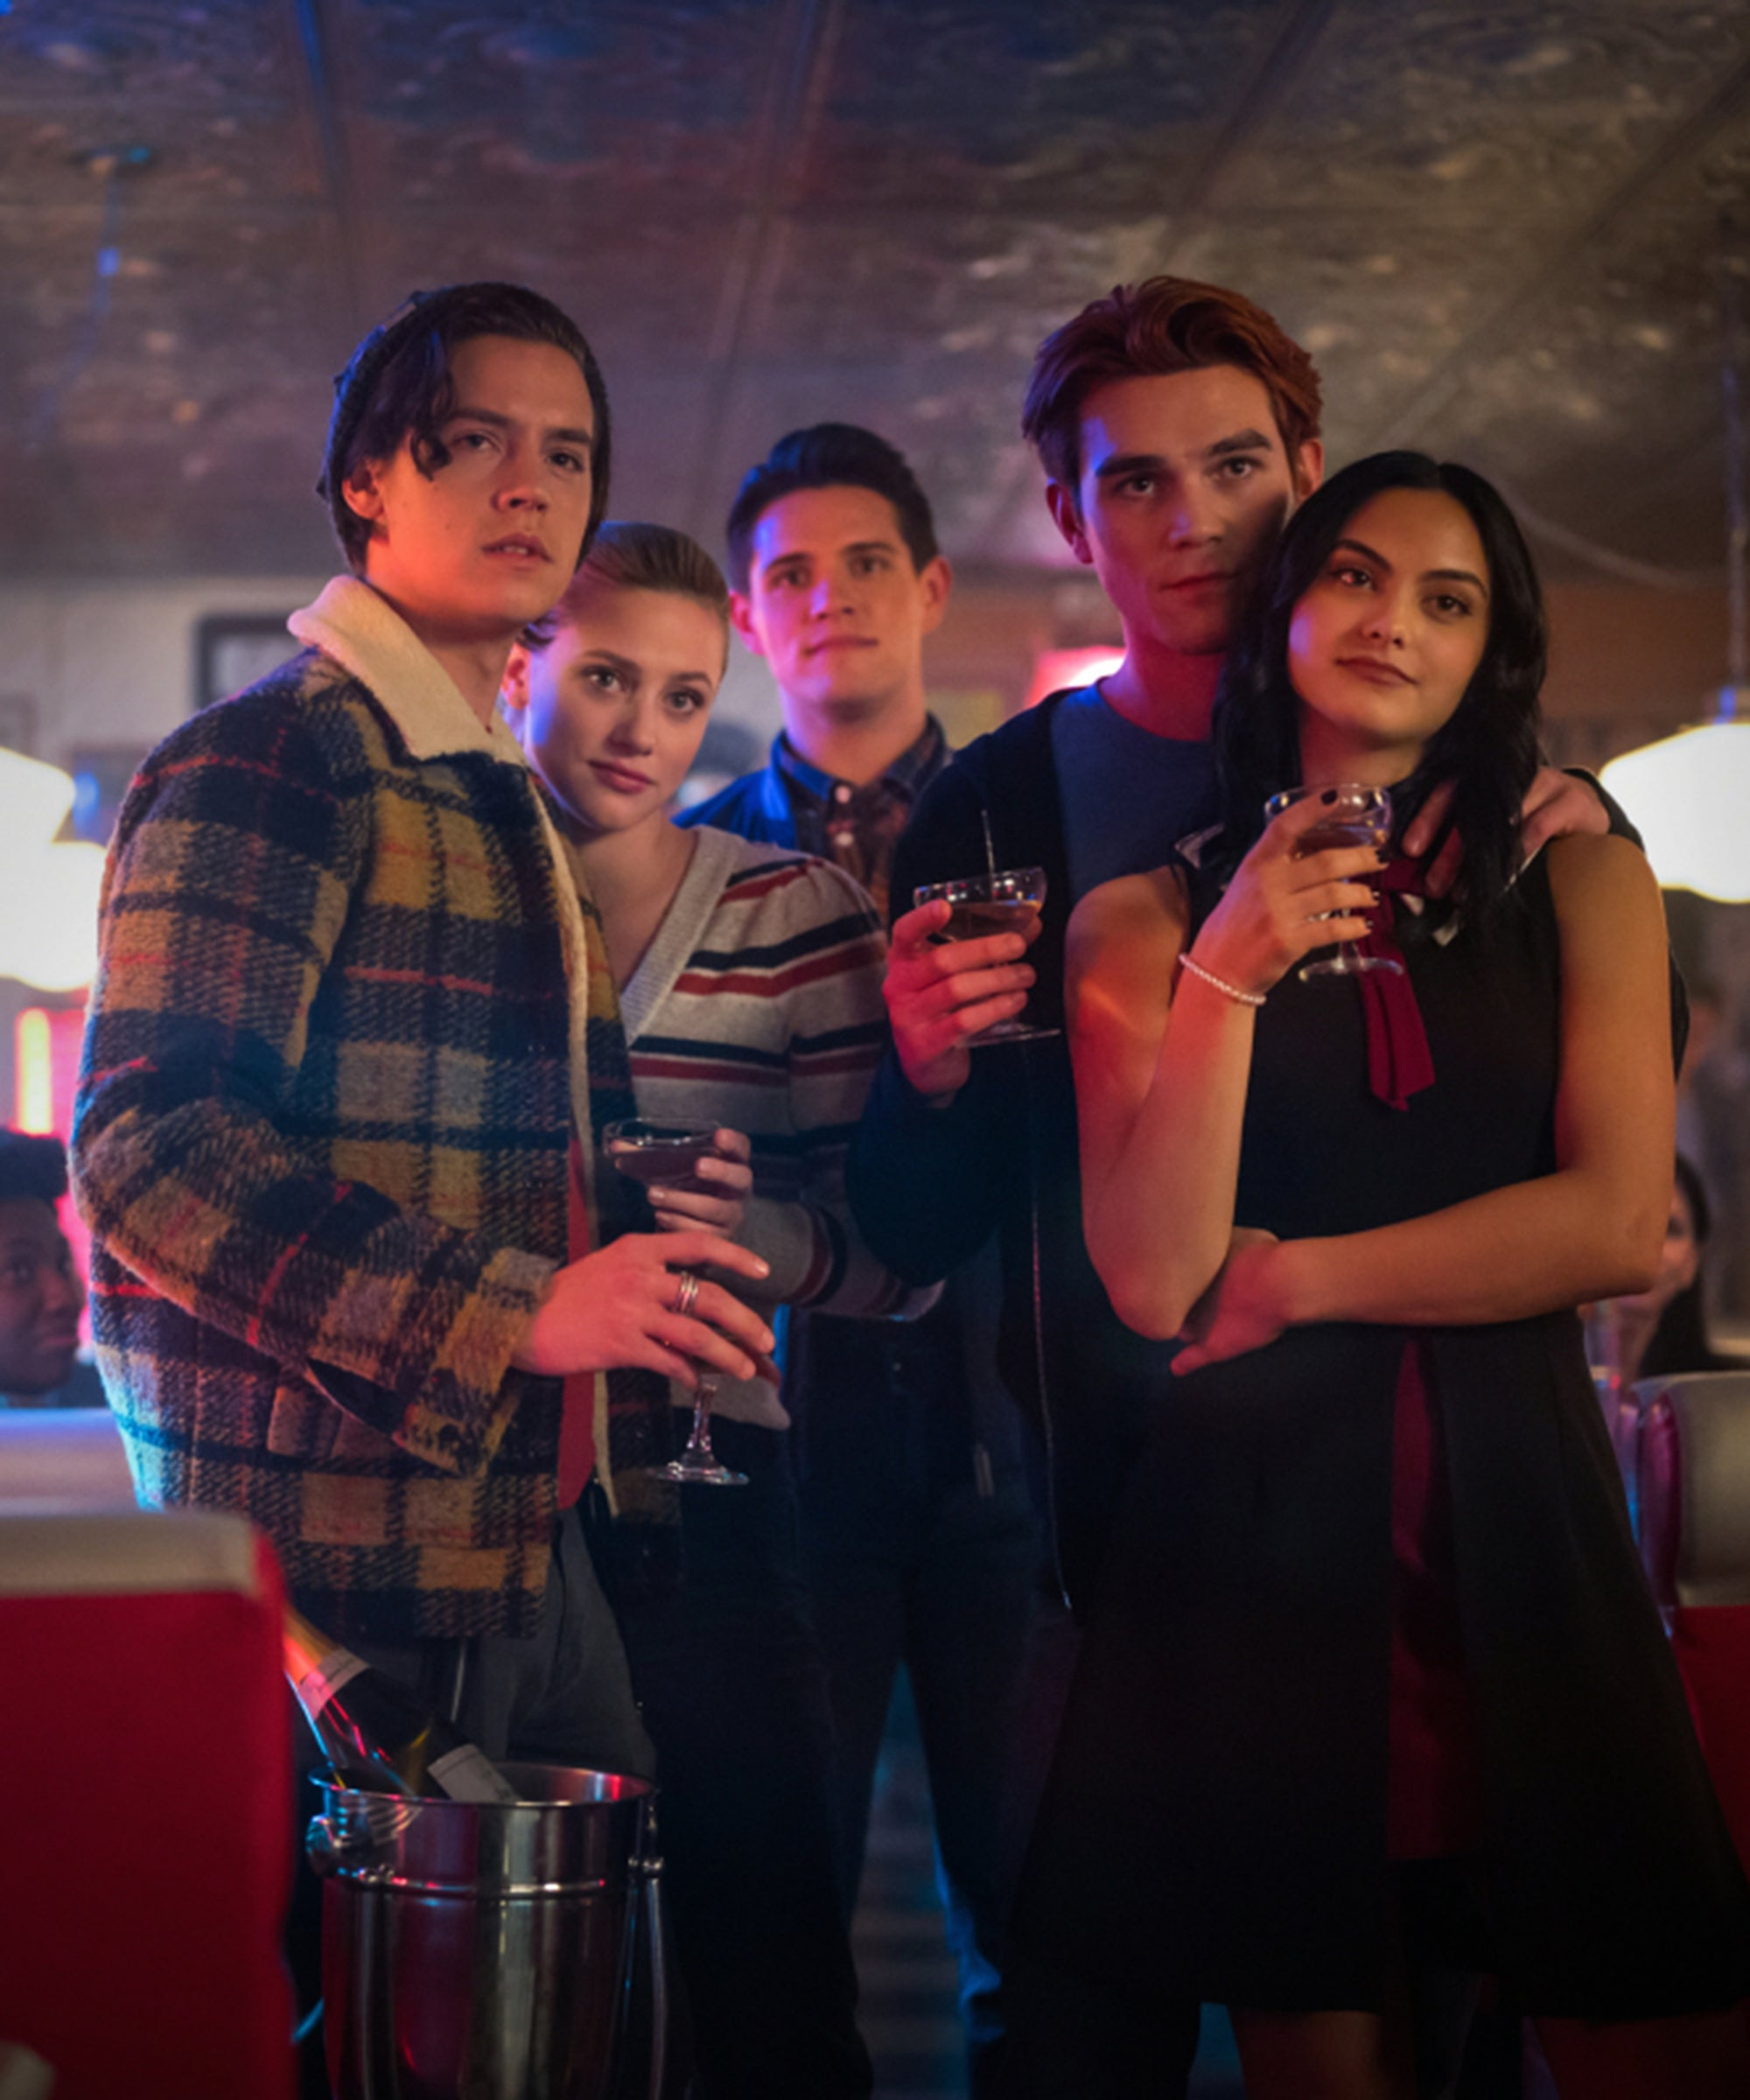 When Will Riverdale Season 5 Premiere? Filming Details